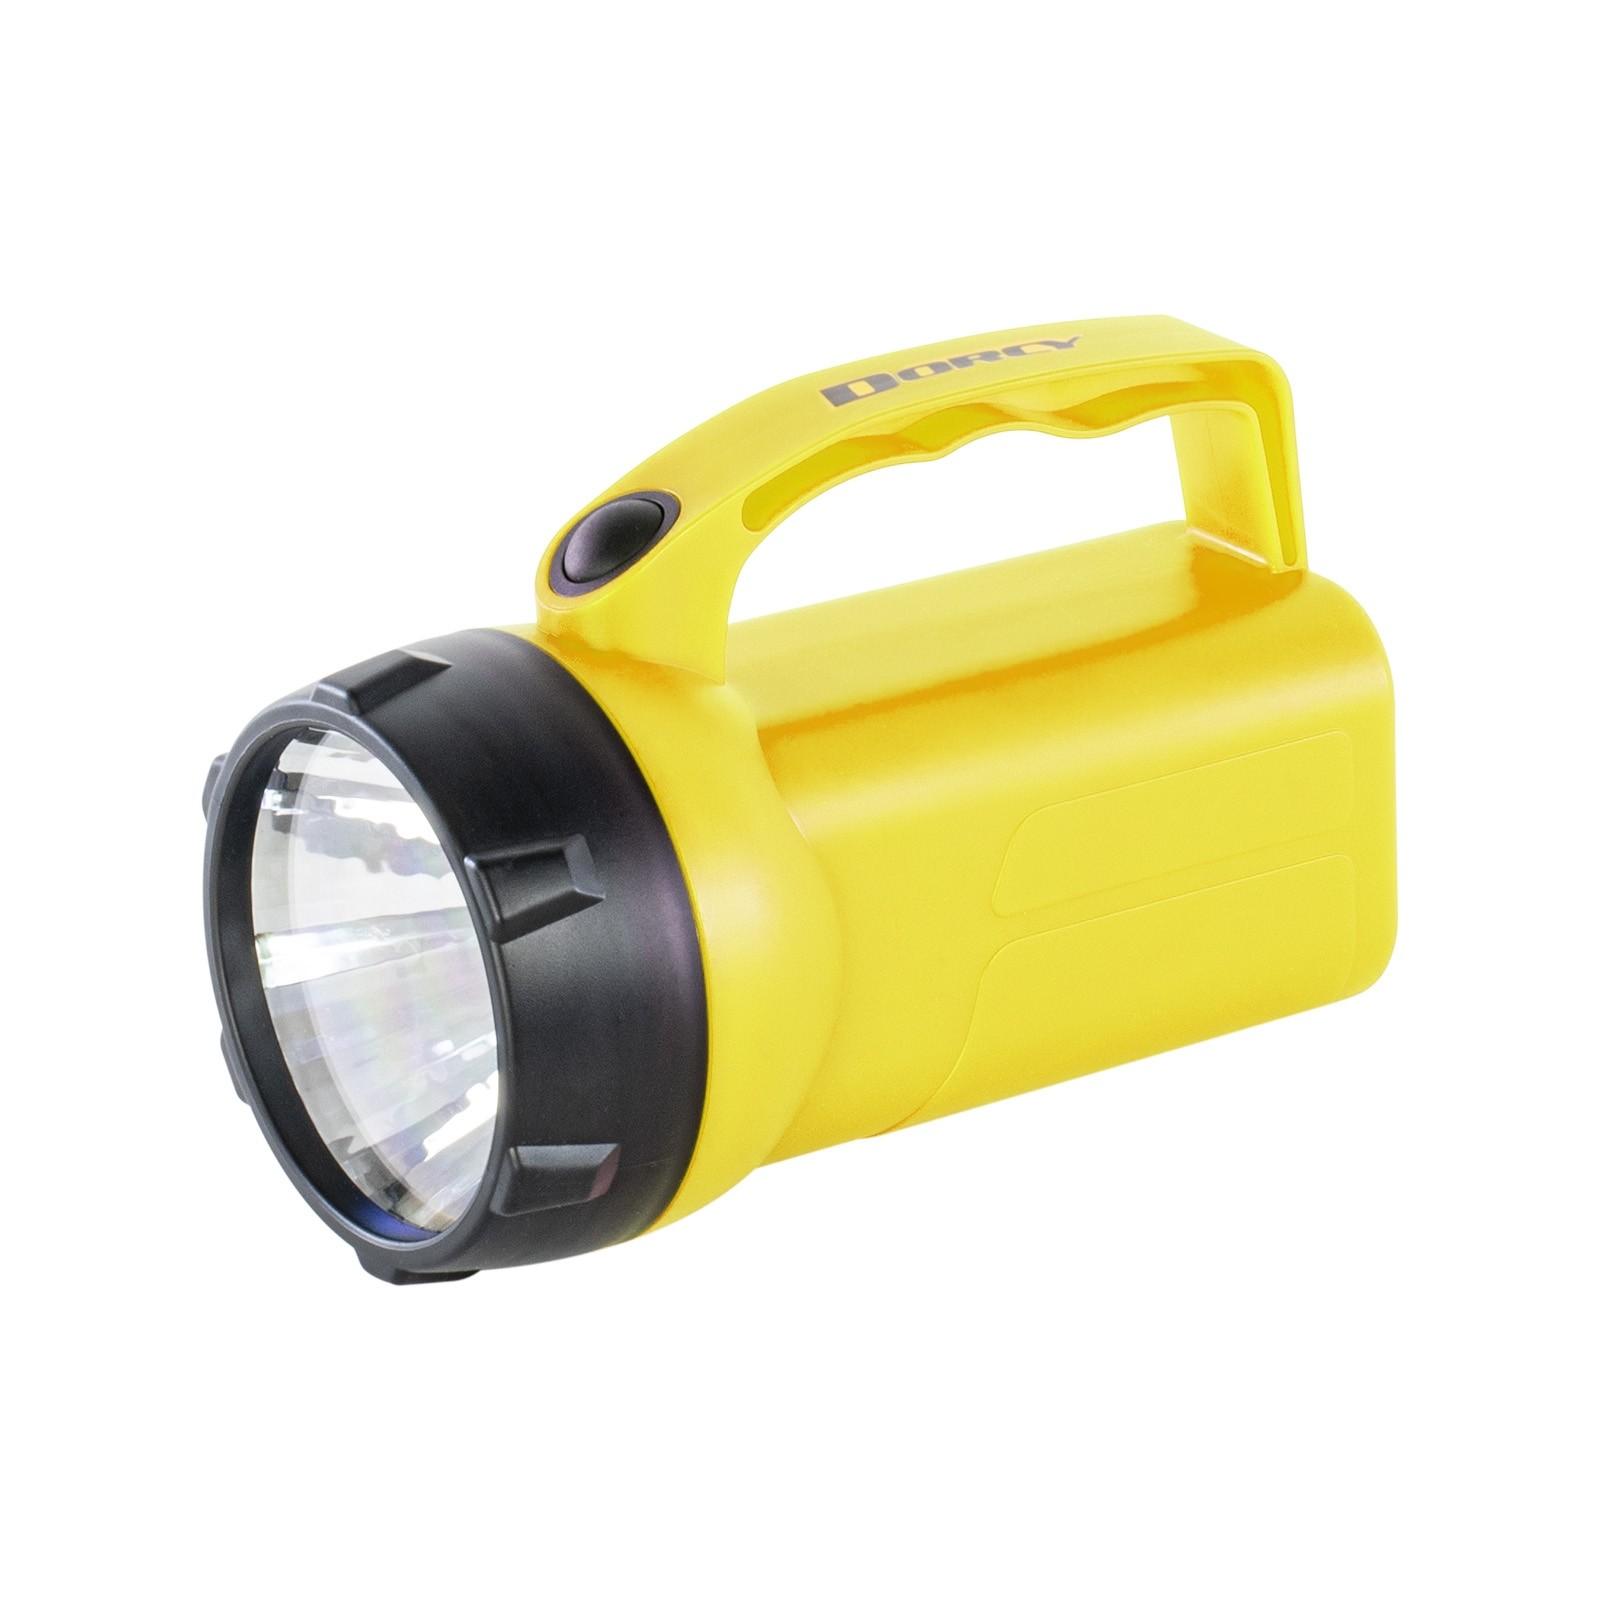 6V Floating LED Lantern